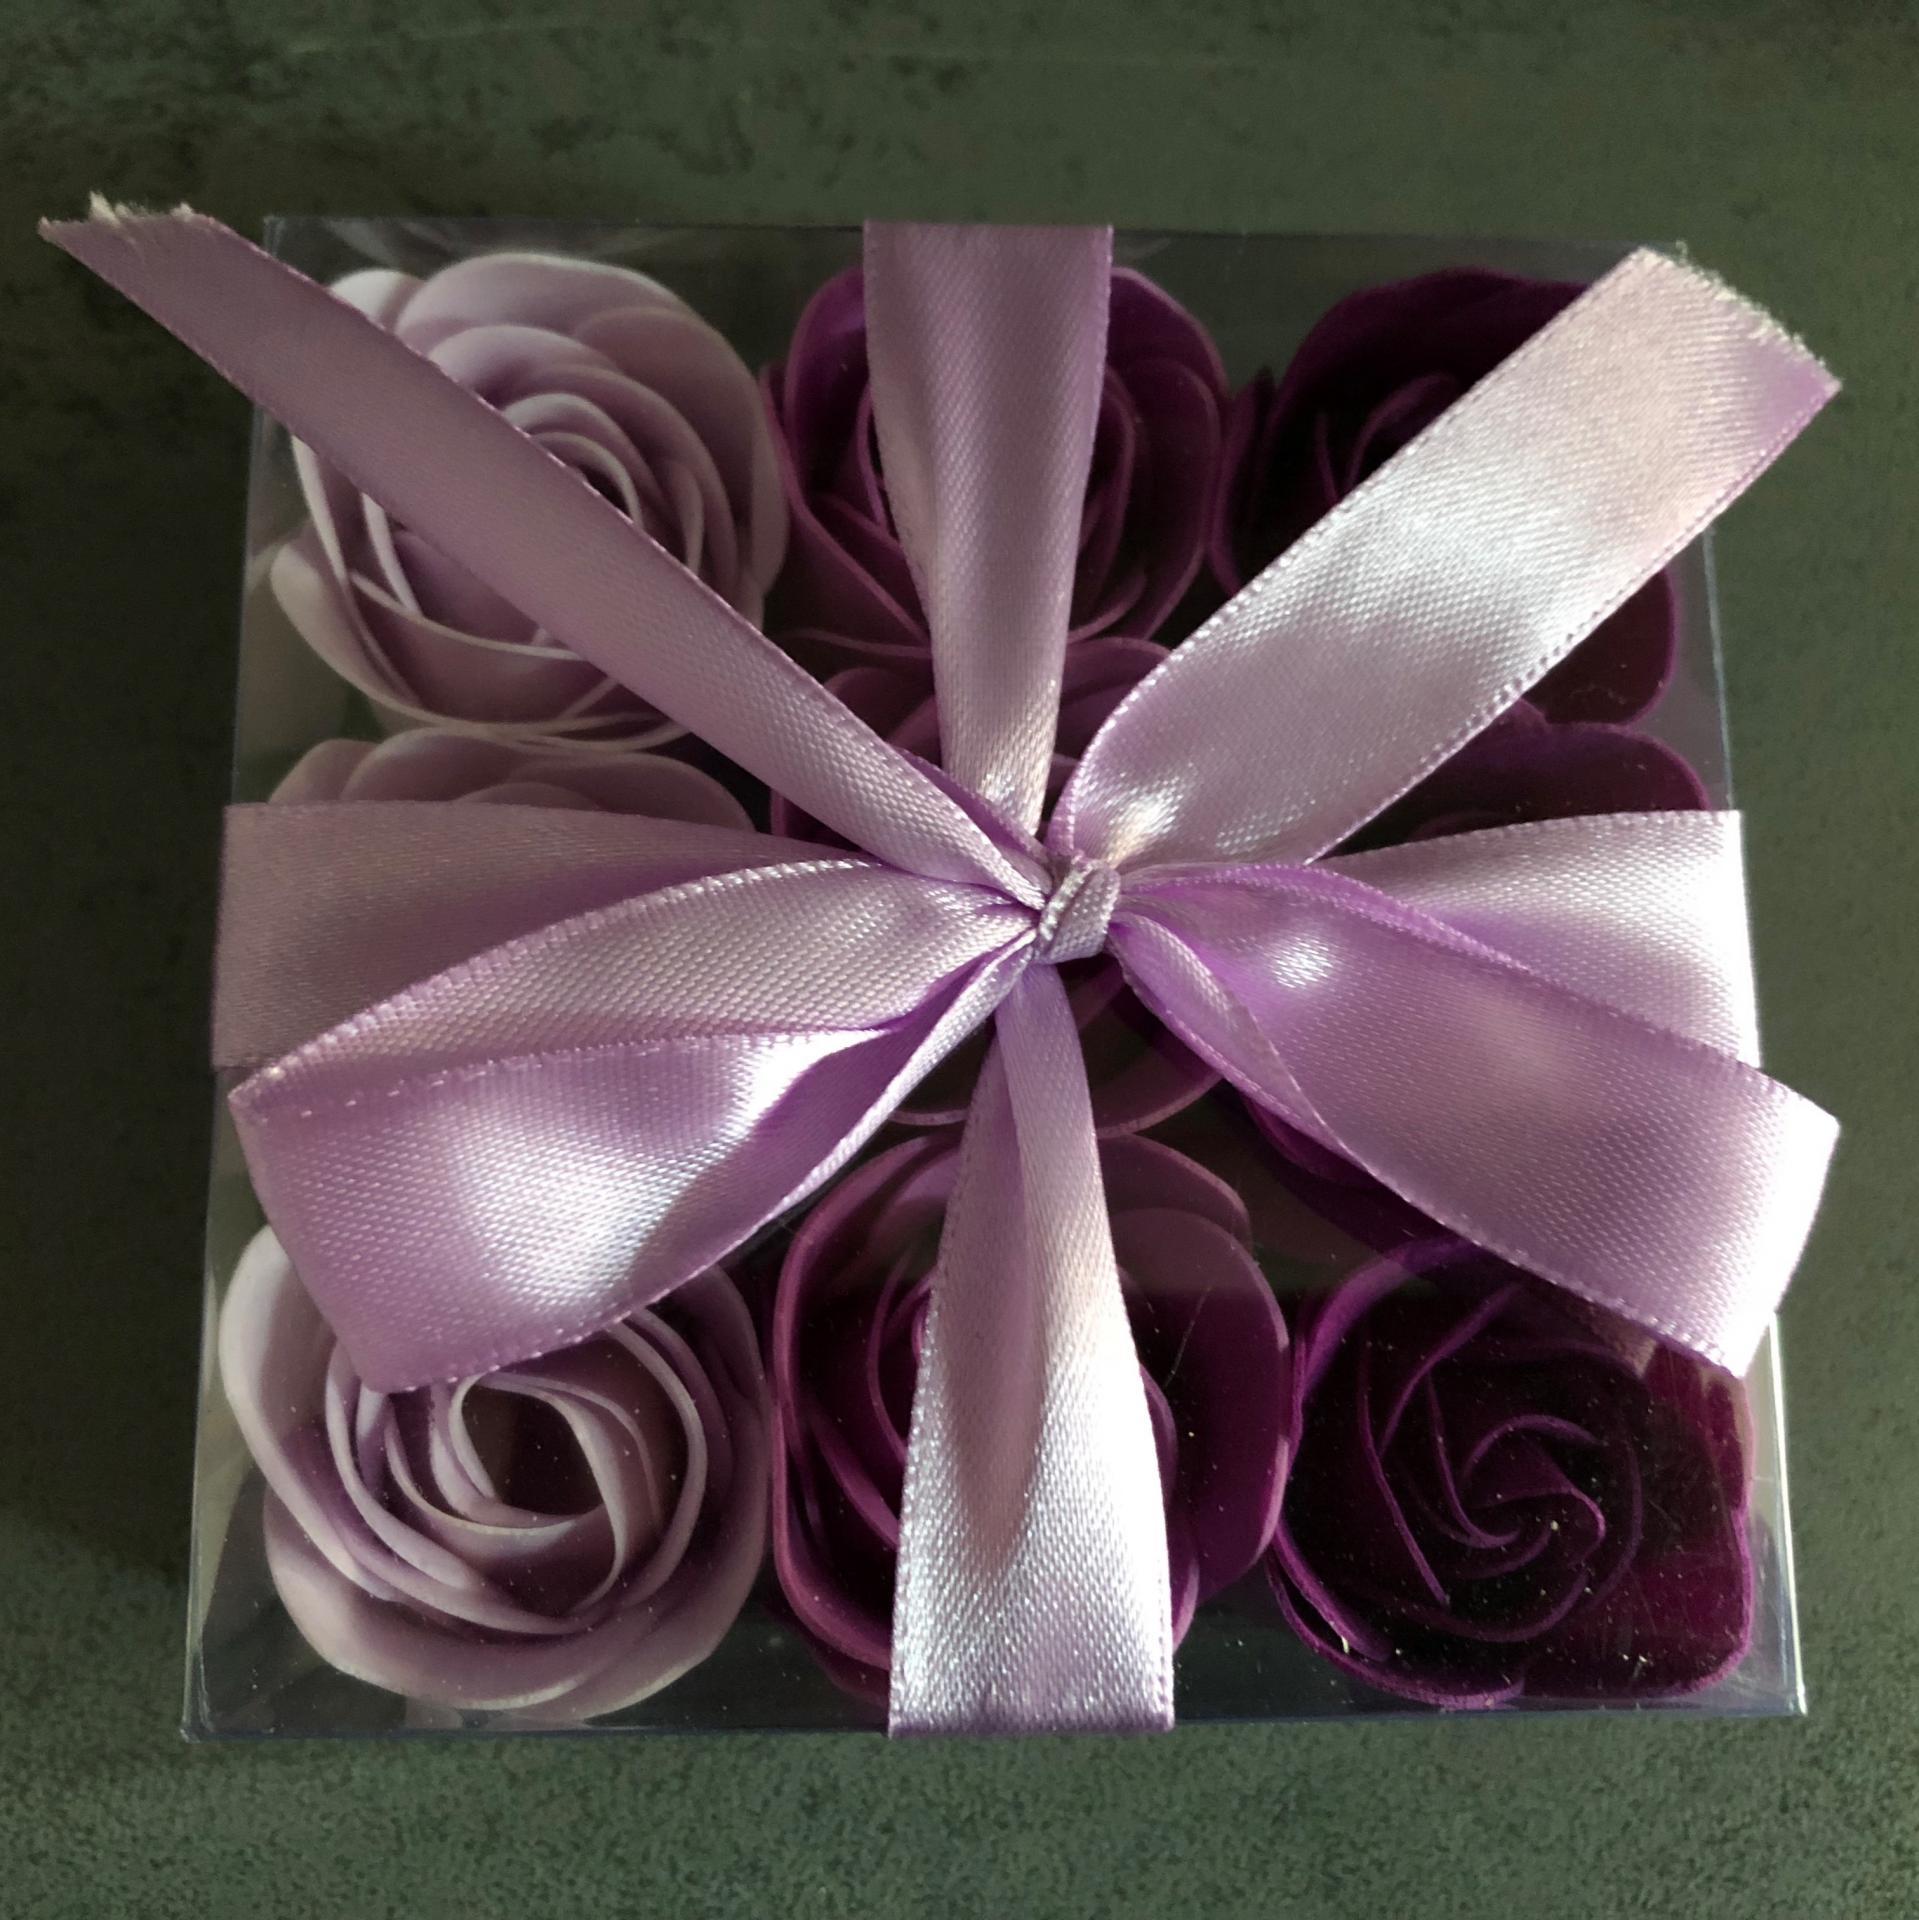 Boutons de rose x9 violet